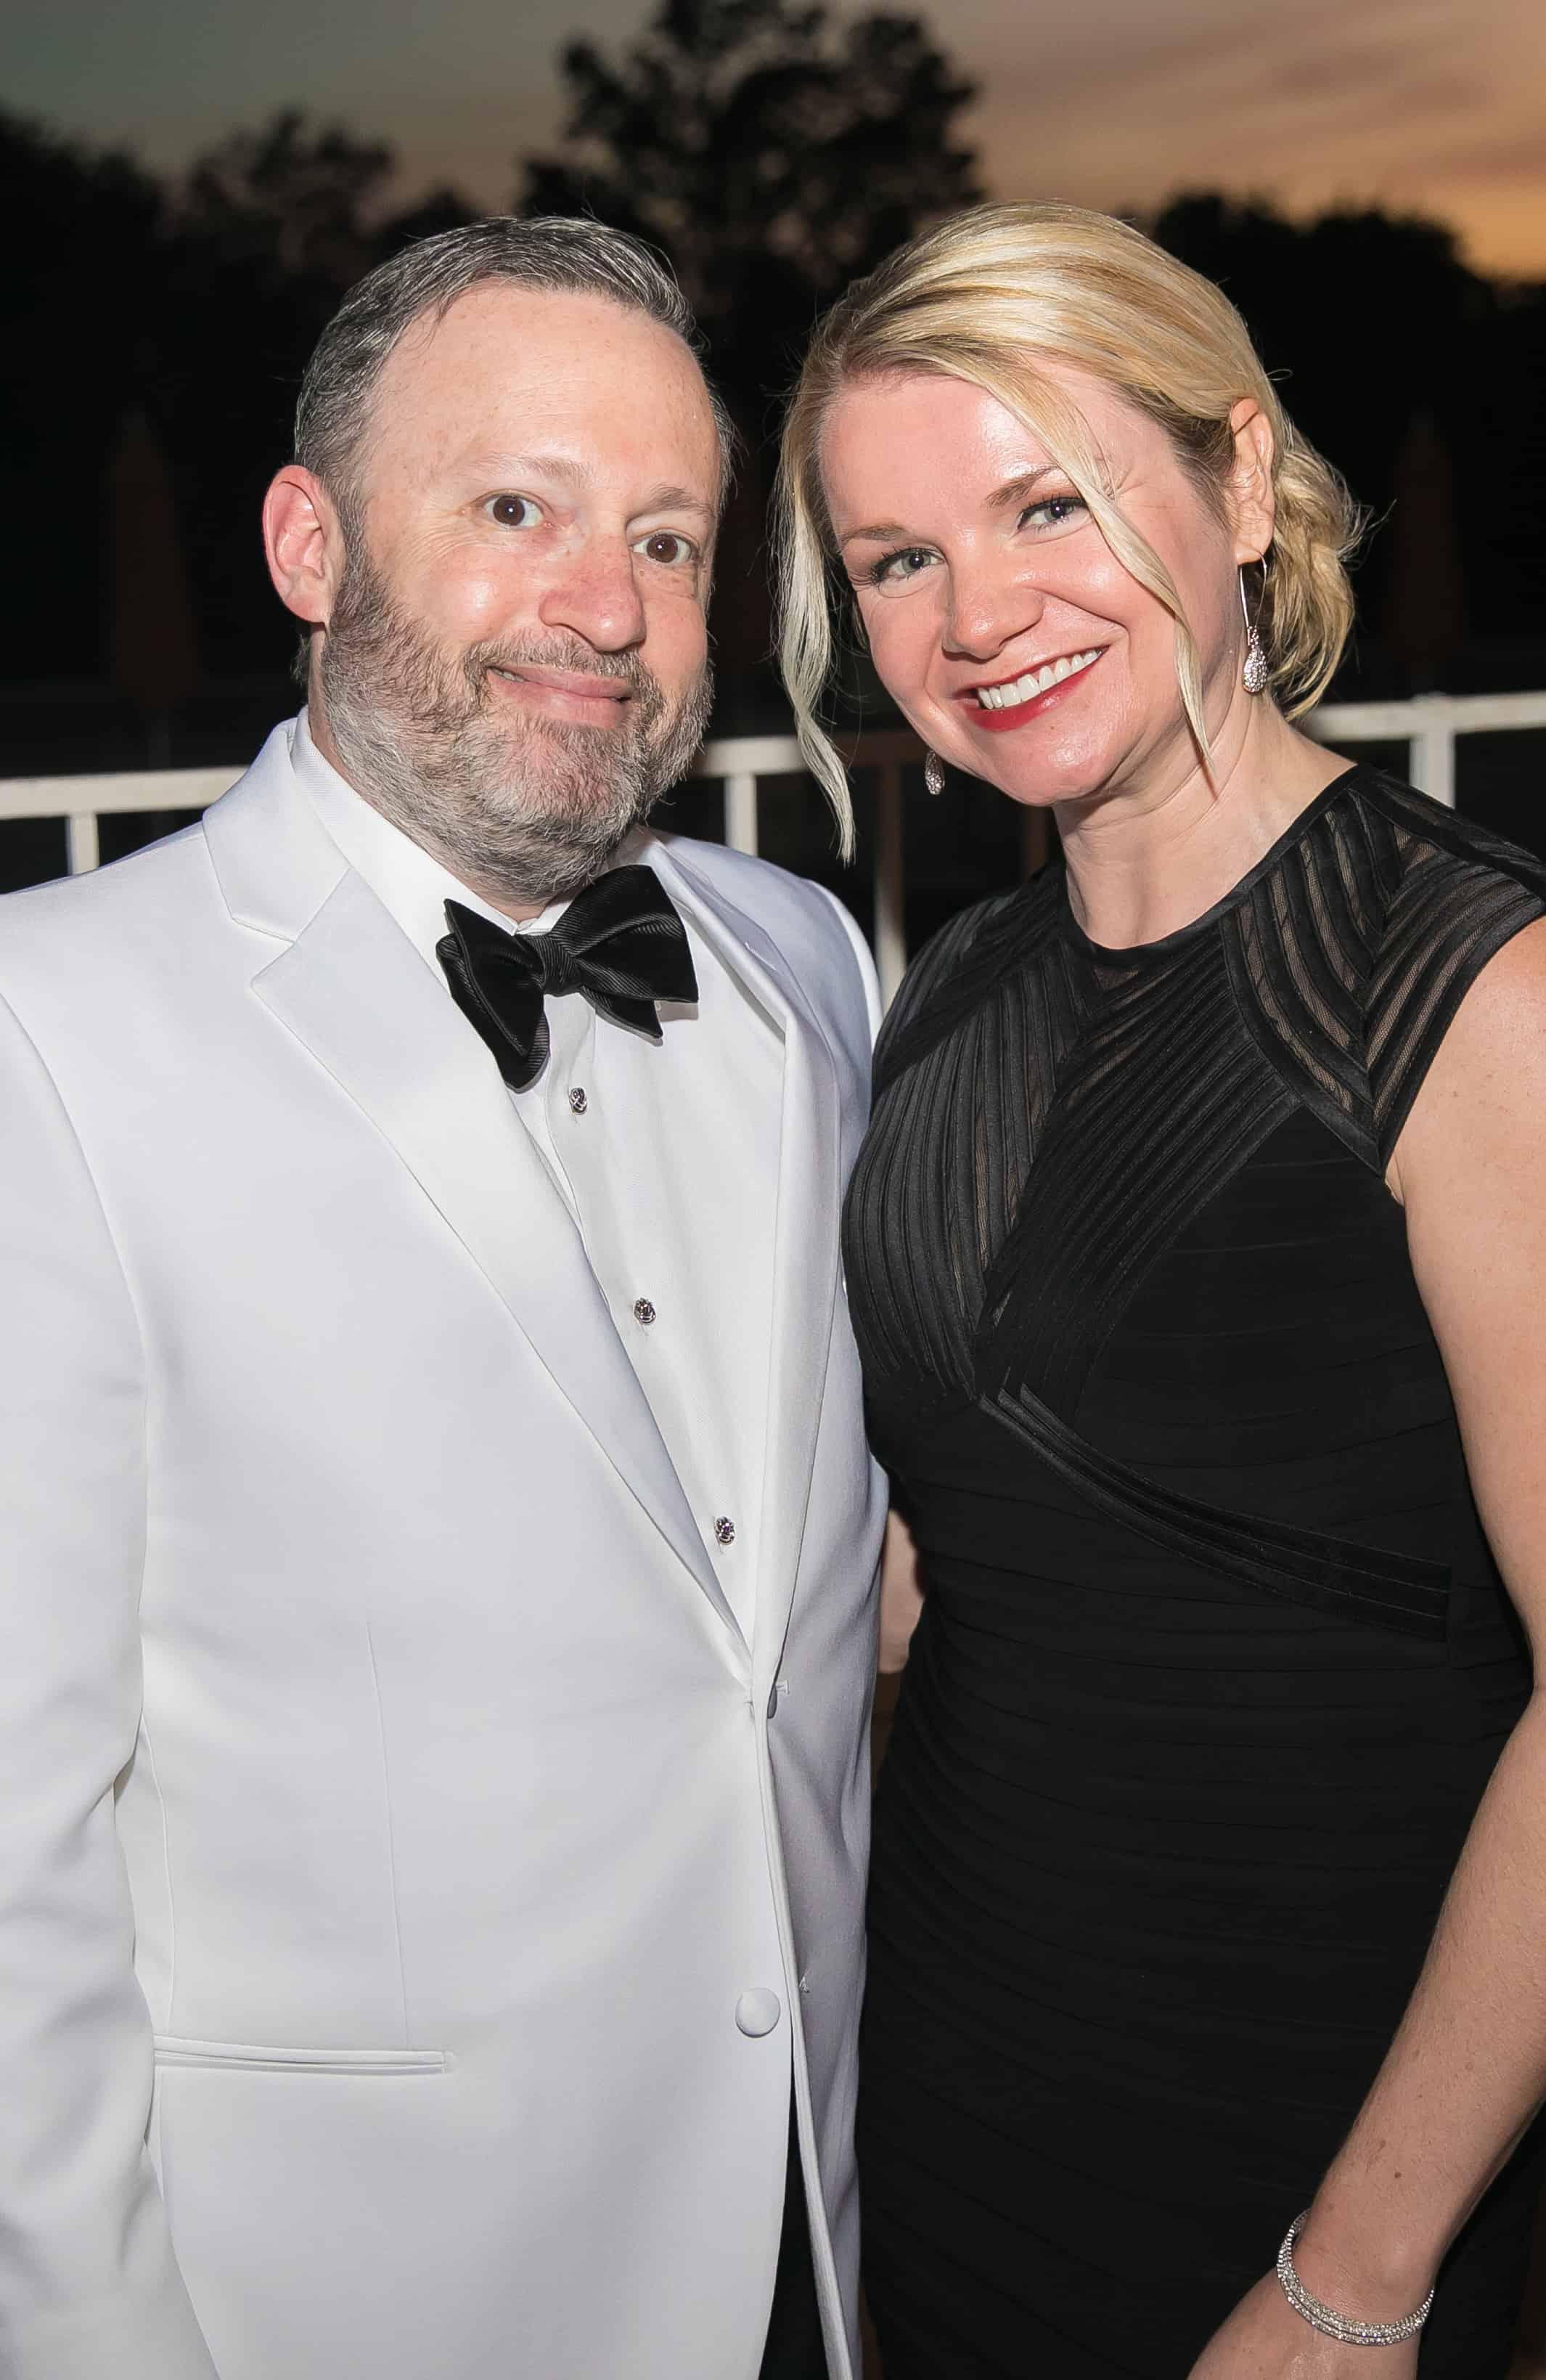 Jay Bernhardt and Cassie Alvarado